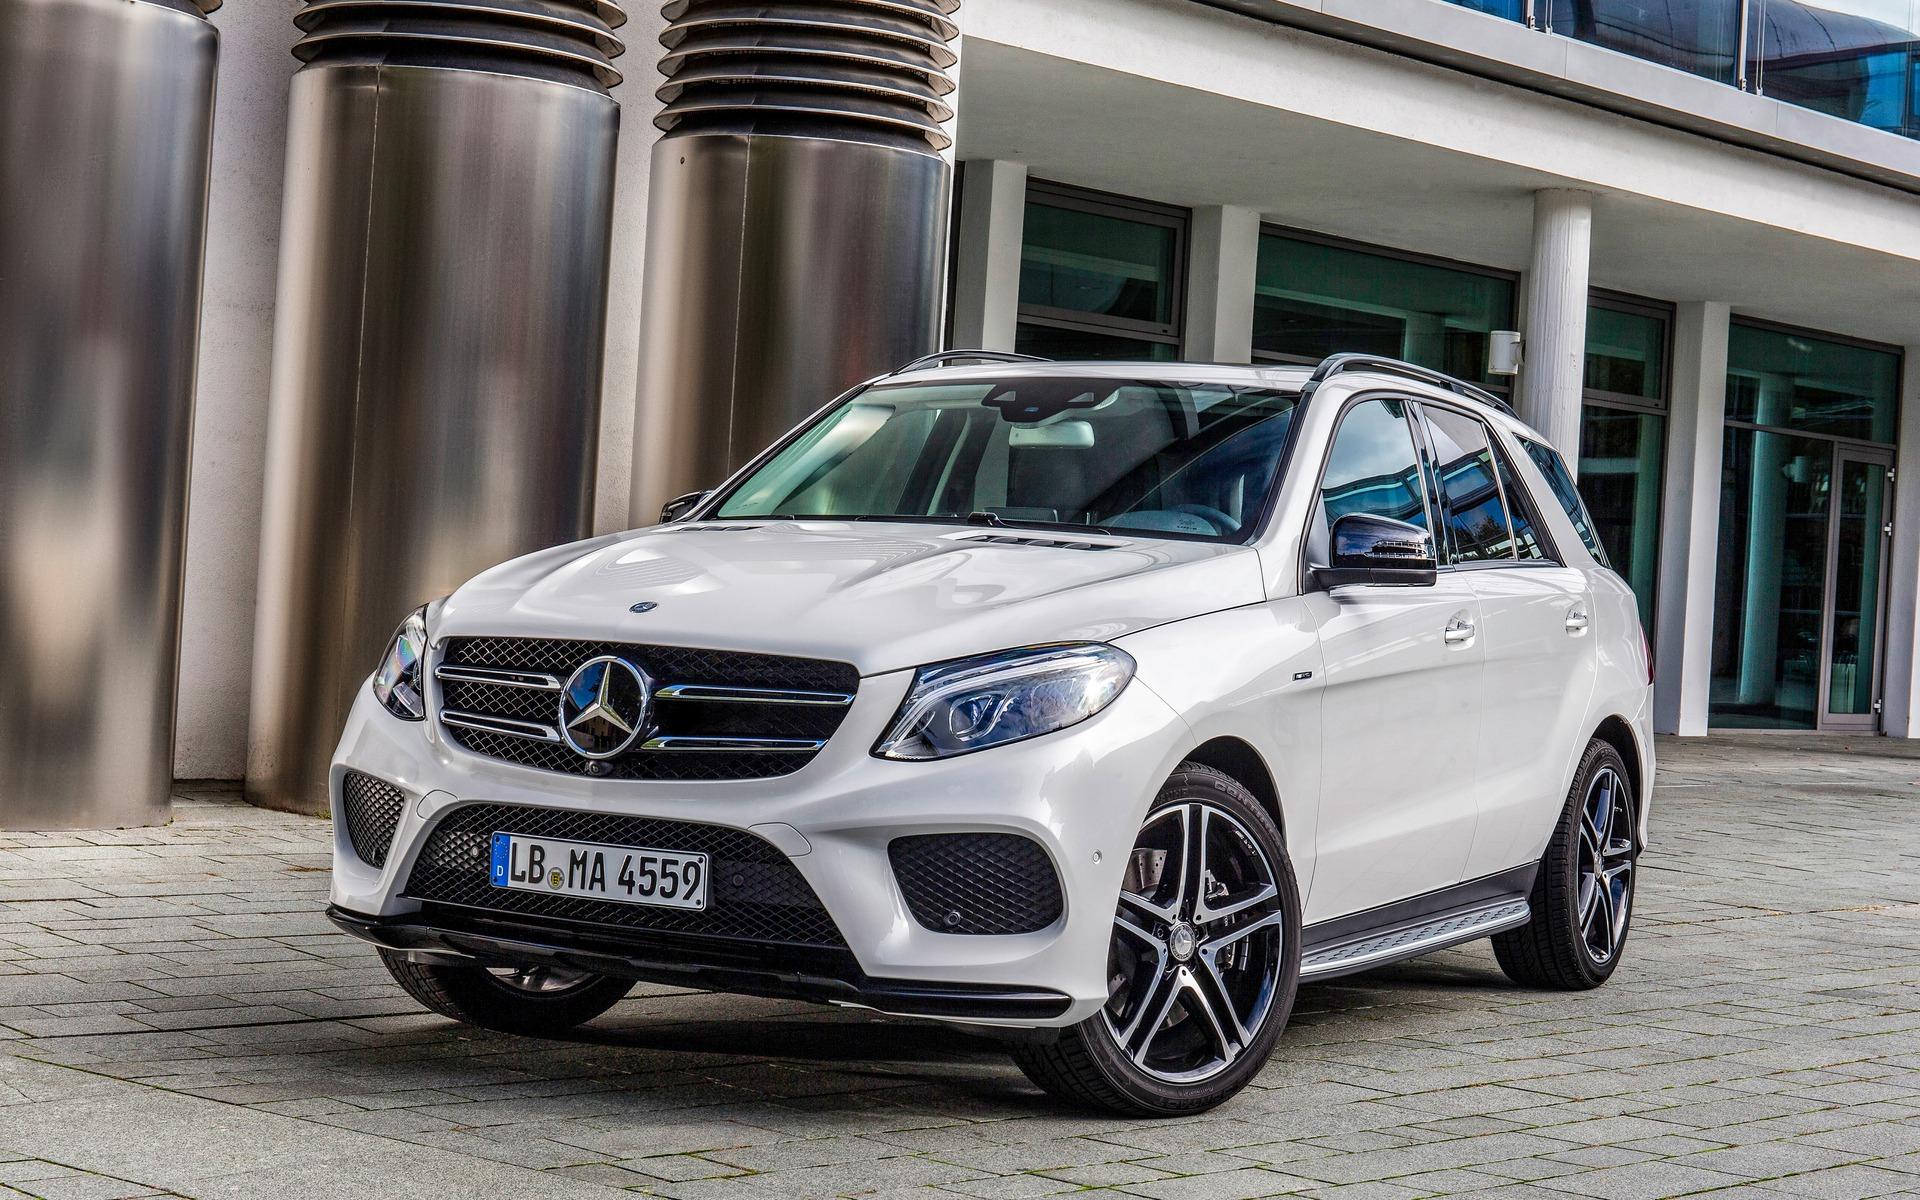 Mercedes benz gle 450 amg 4matic 2016 logique germanique for Mercedes benz gle class